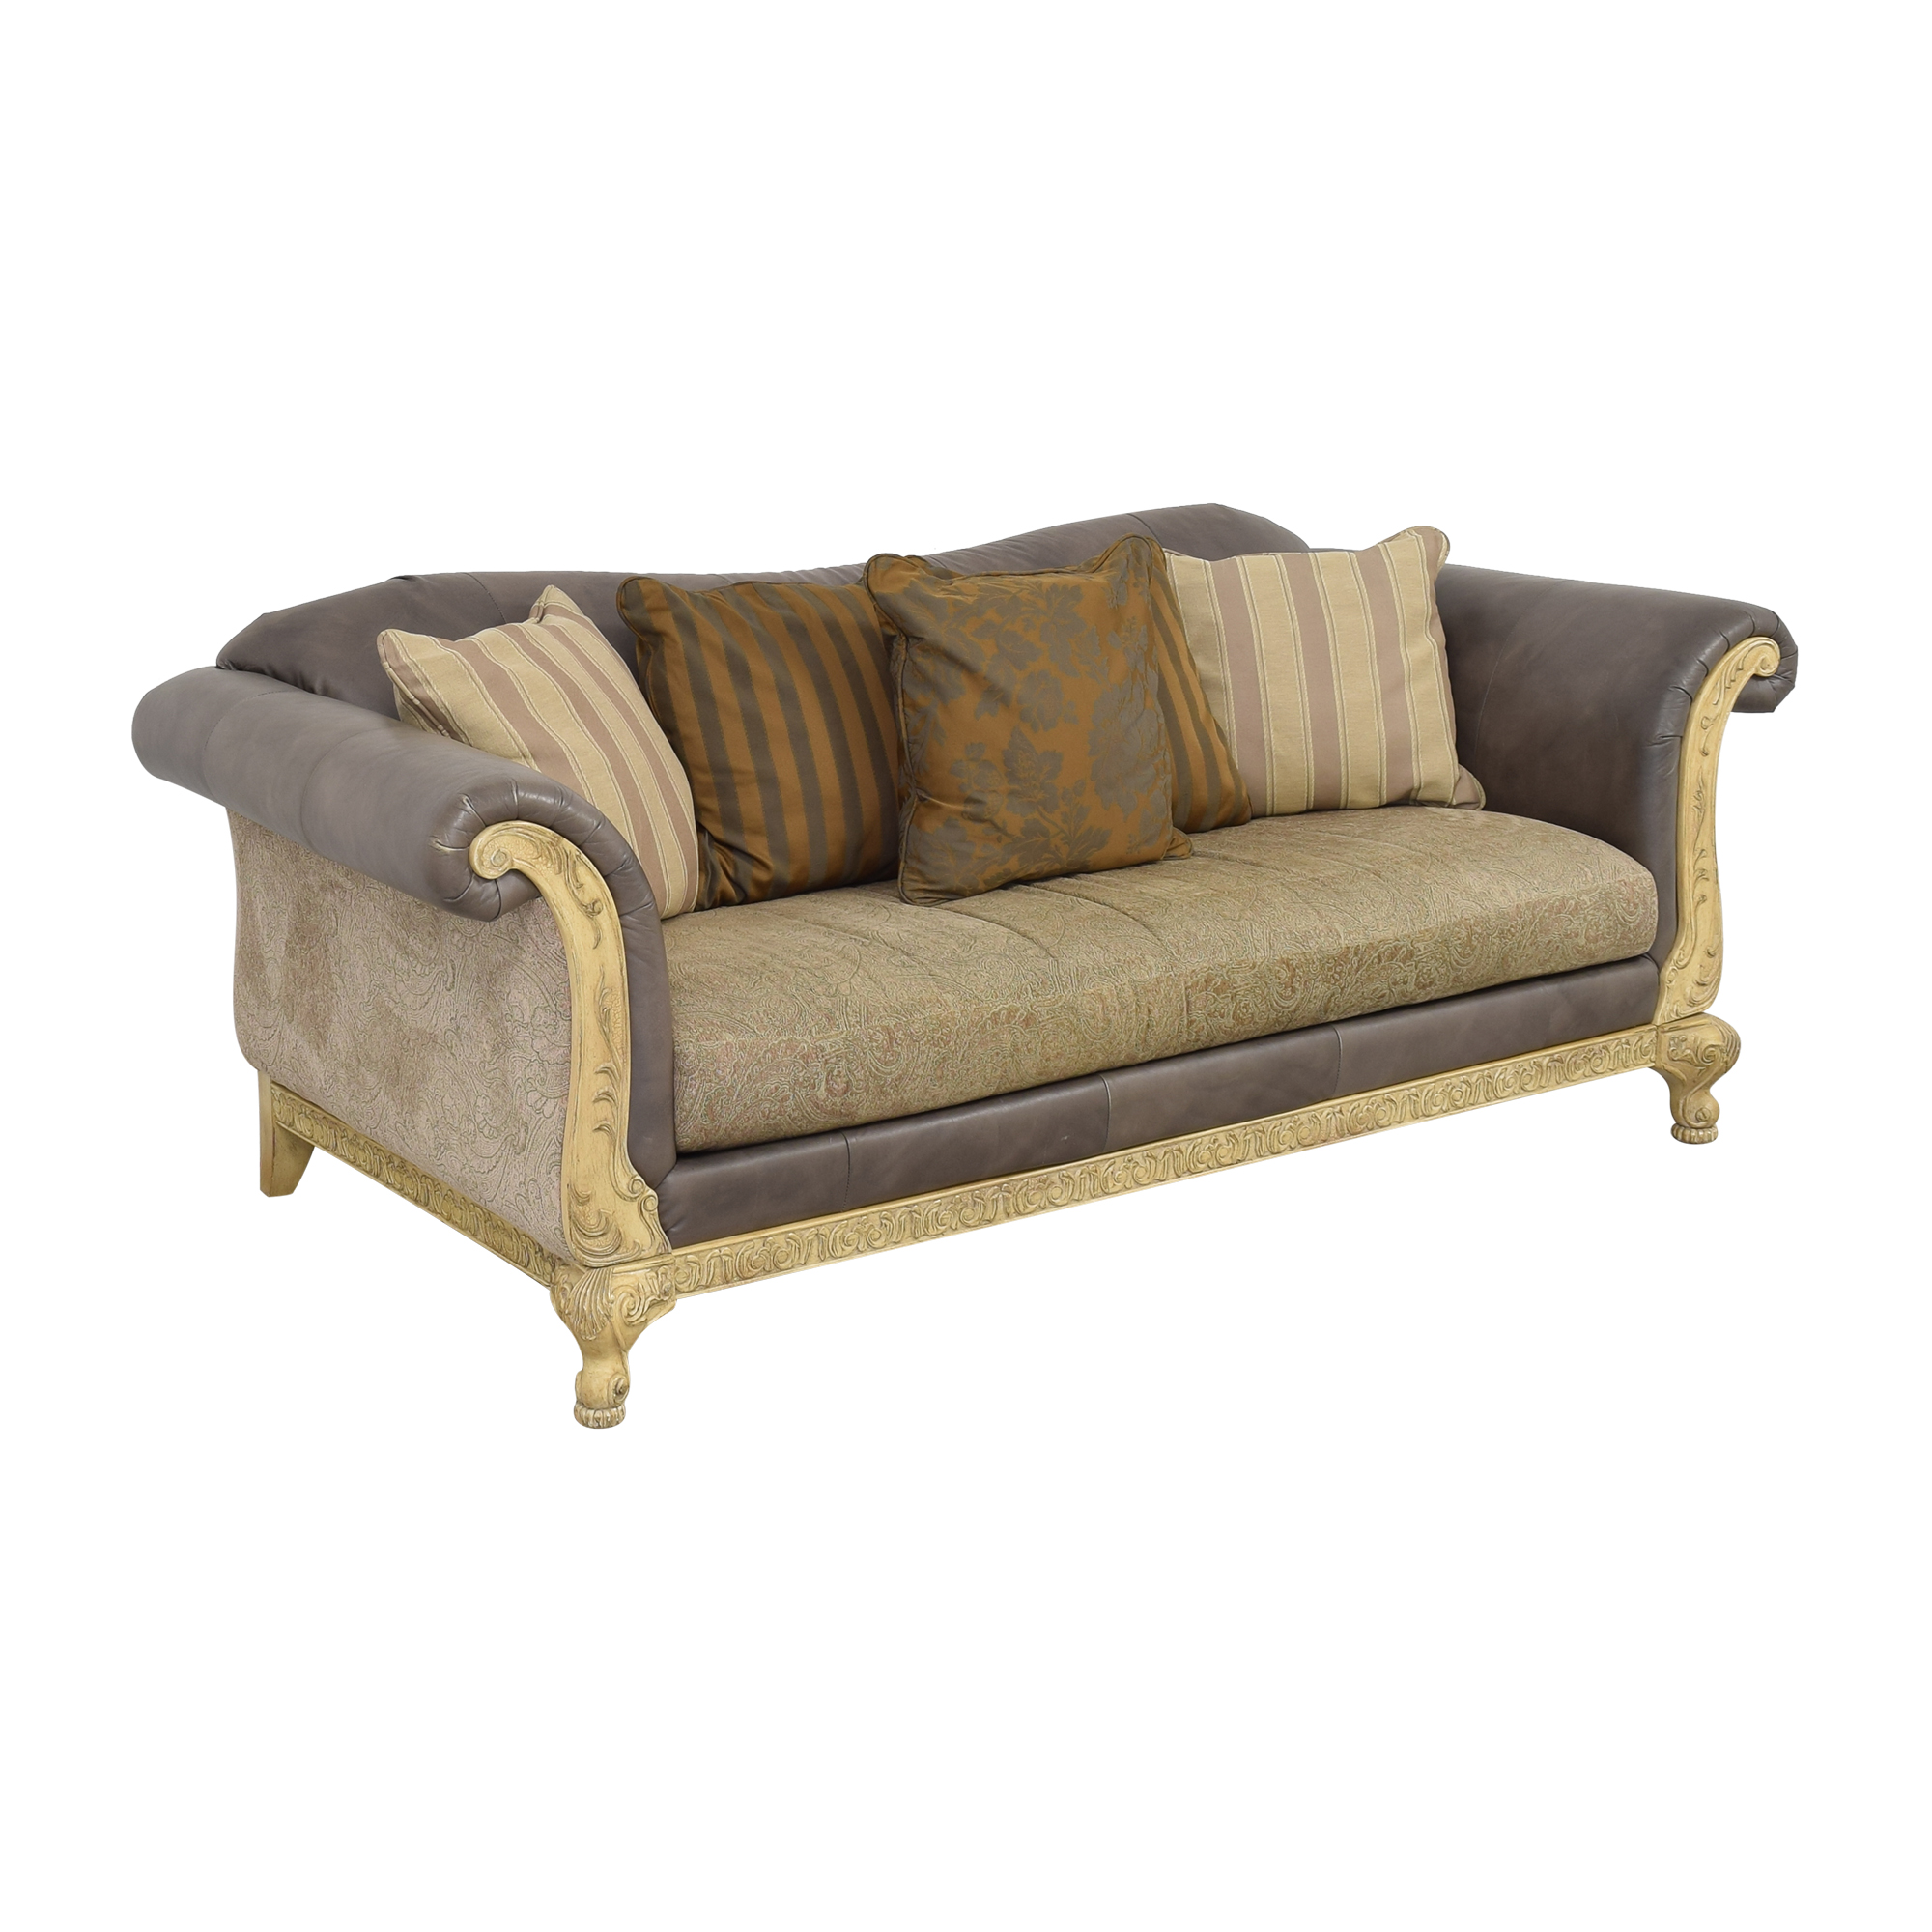 Schnadig Decorative Bench Cushion Sofa / Classic Sofas